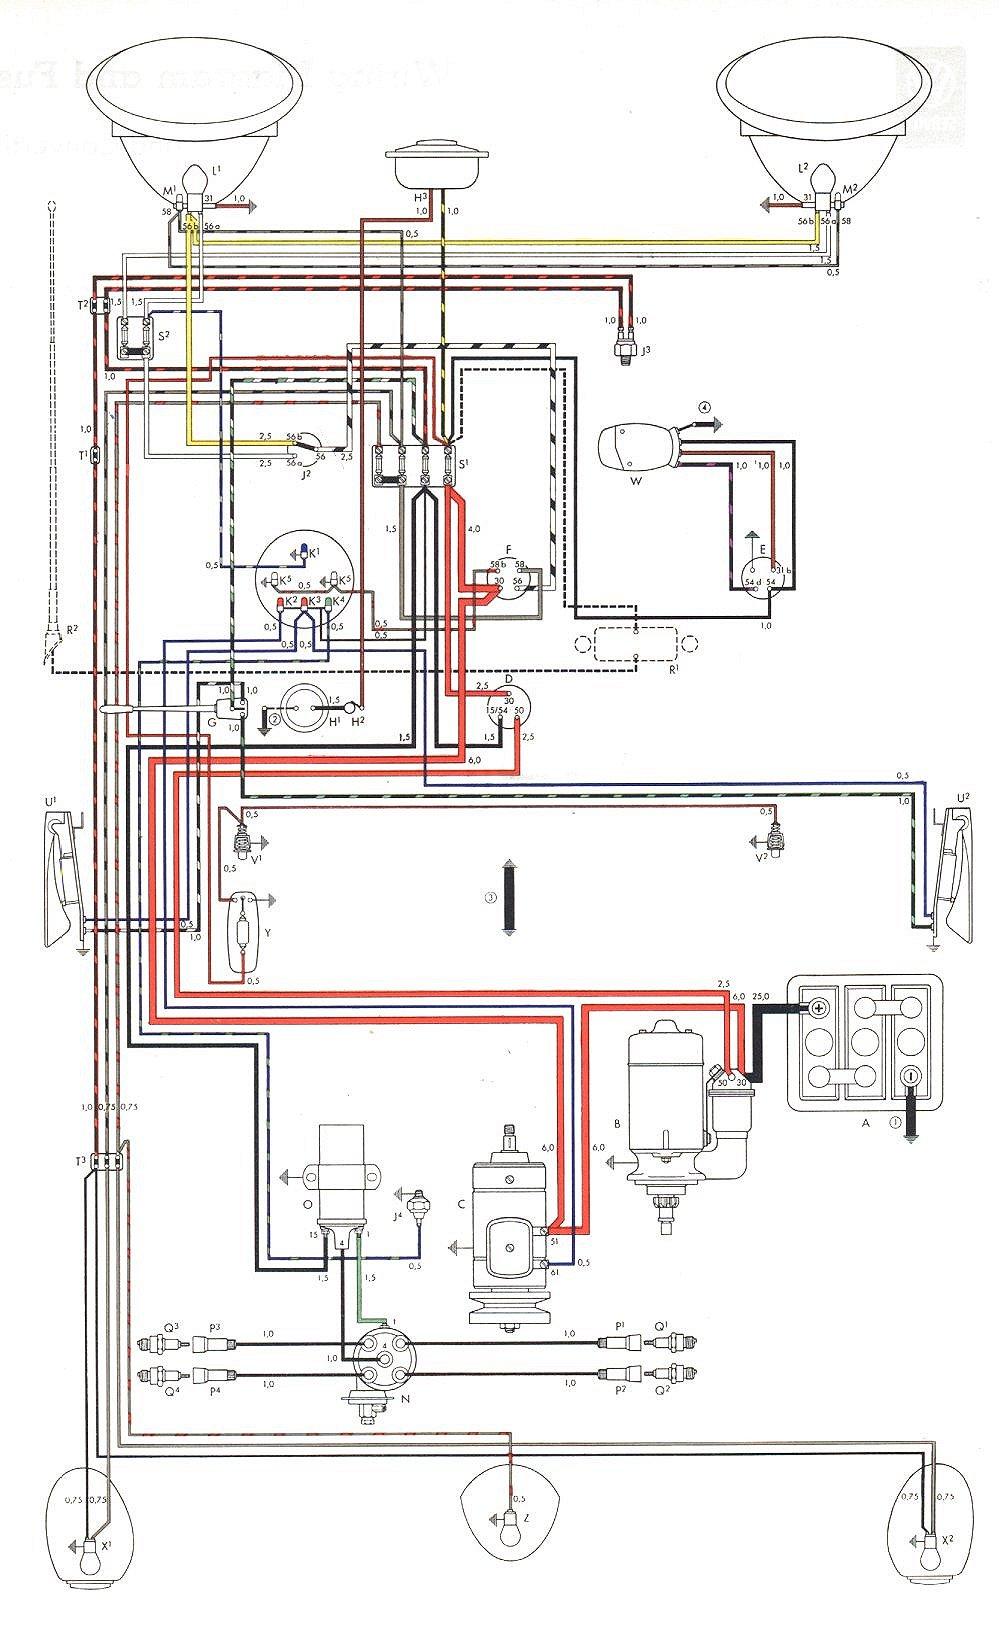 2000 Vw Jetta Wiring Diagram - Wiring Diagram